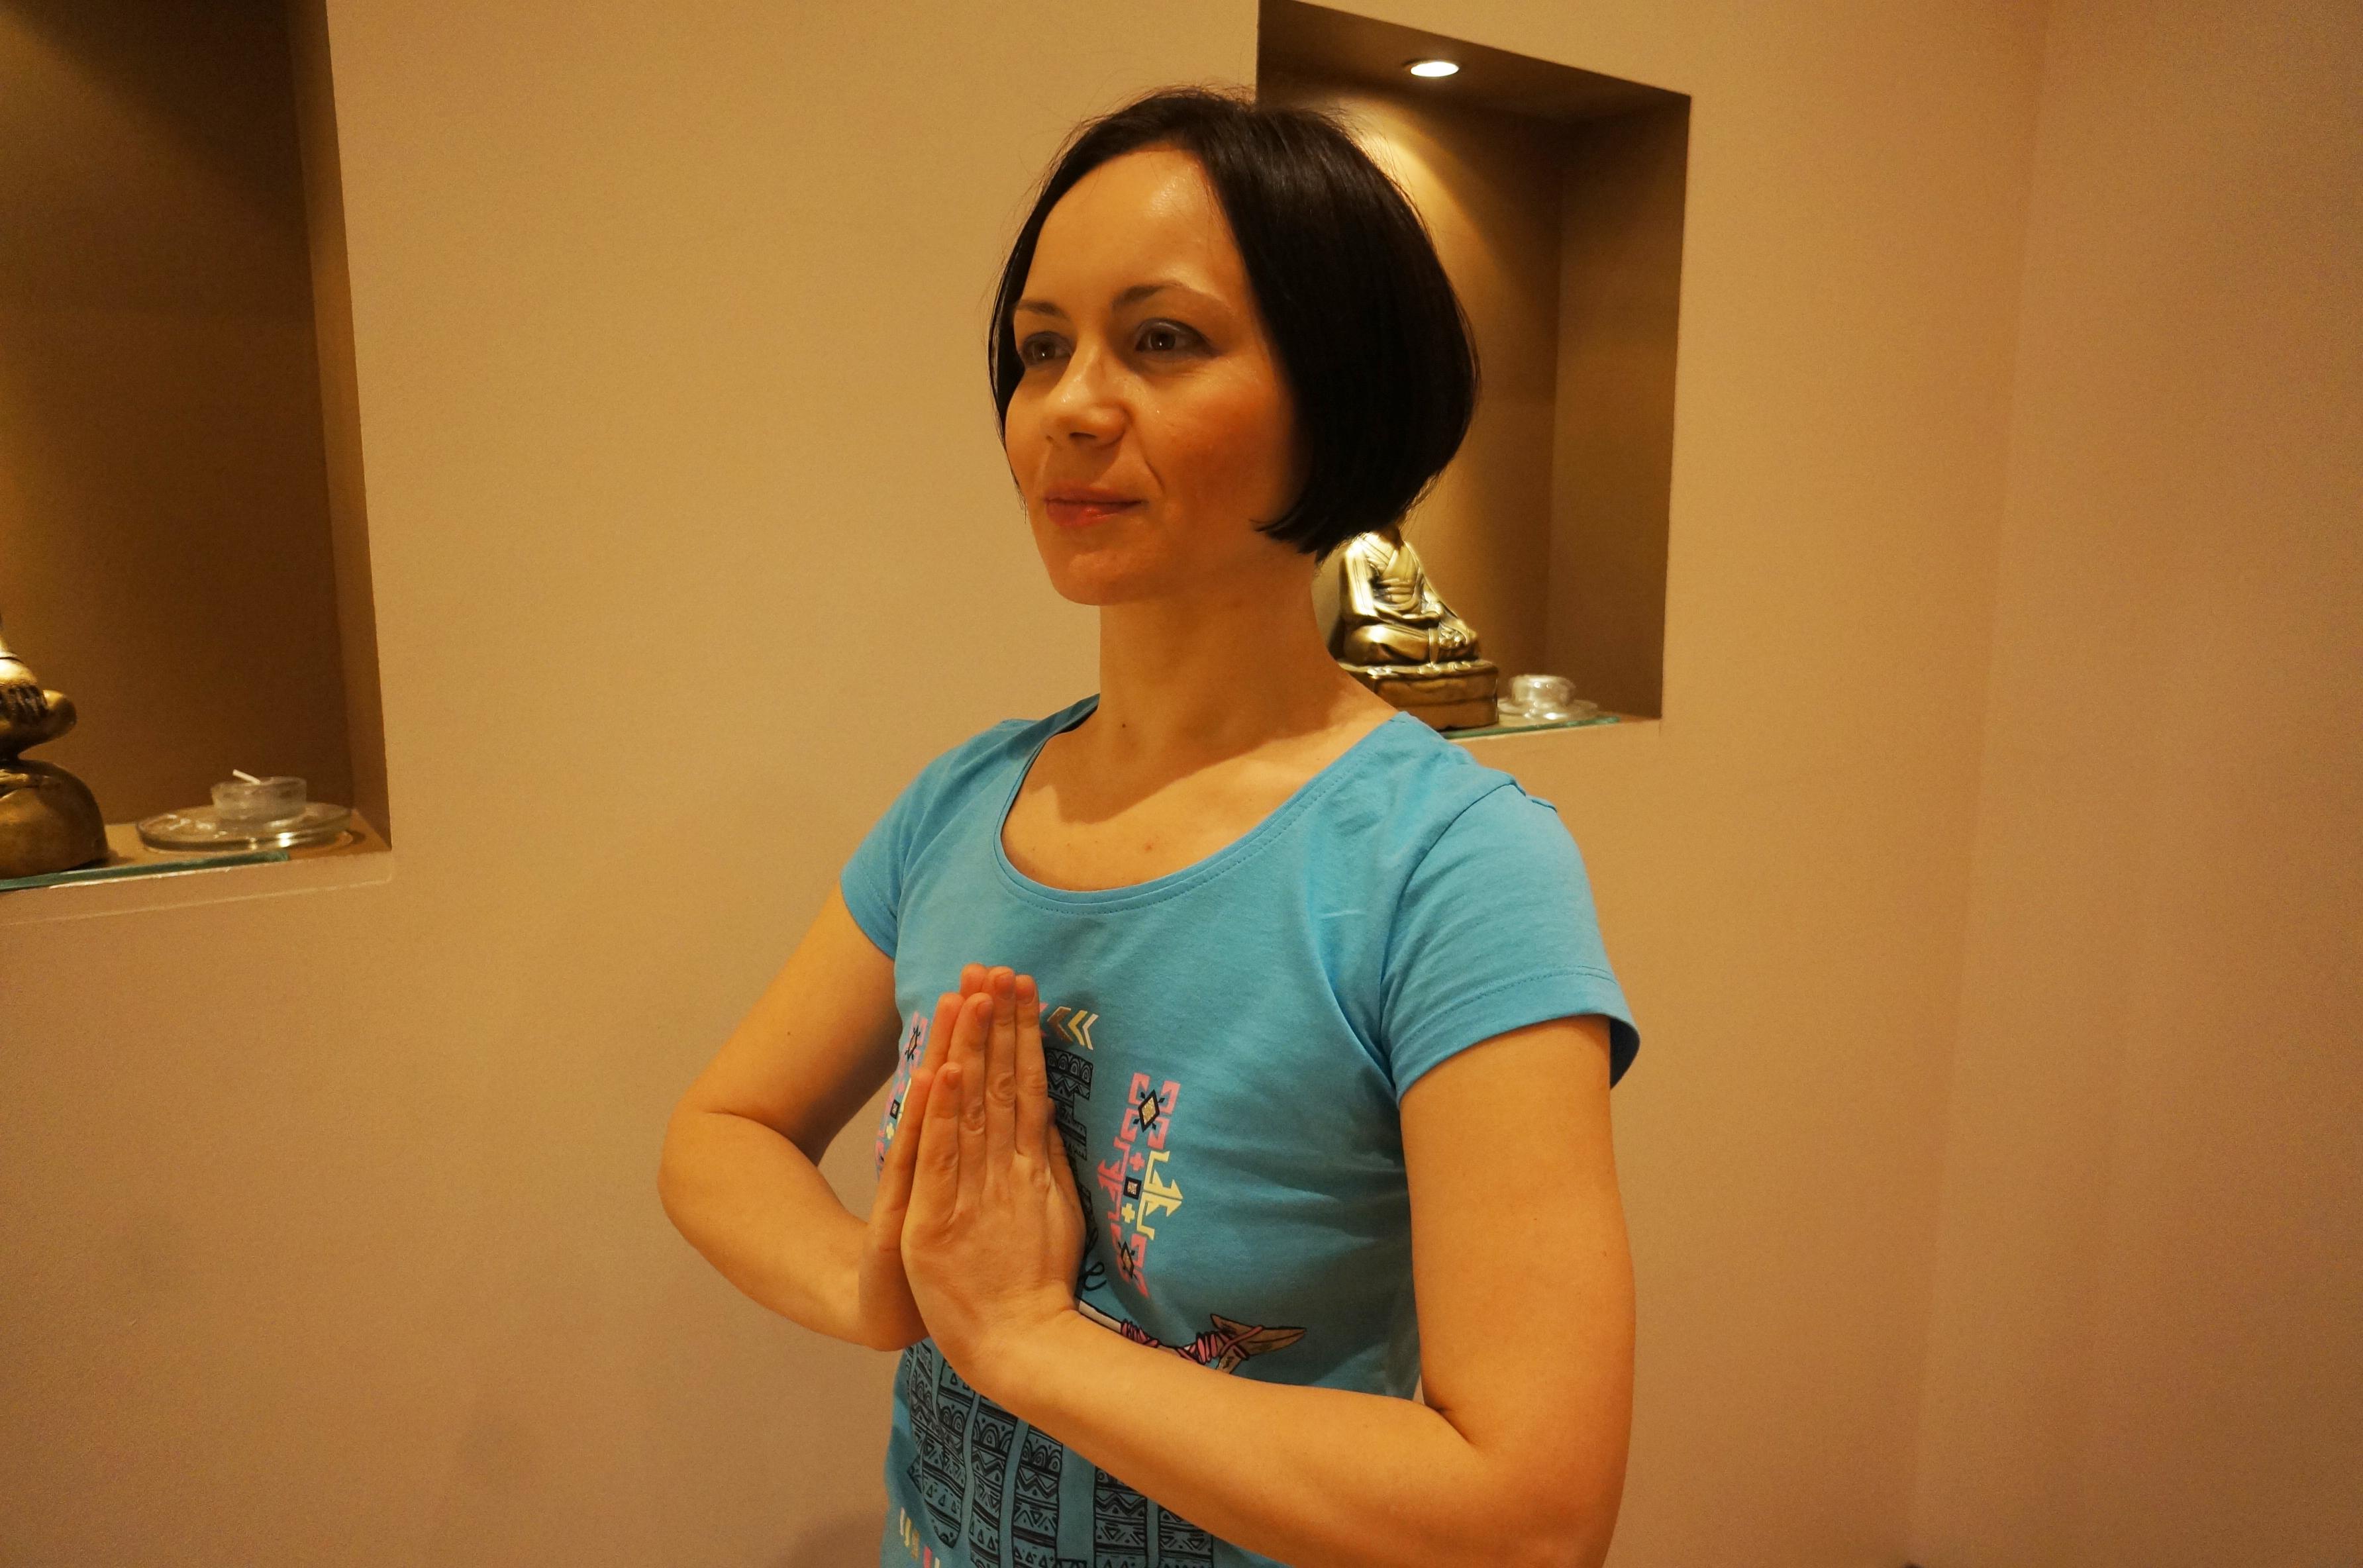 Розикова Ольга